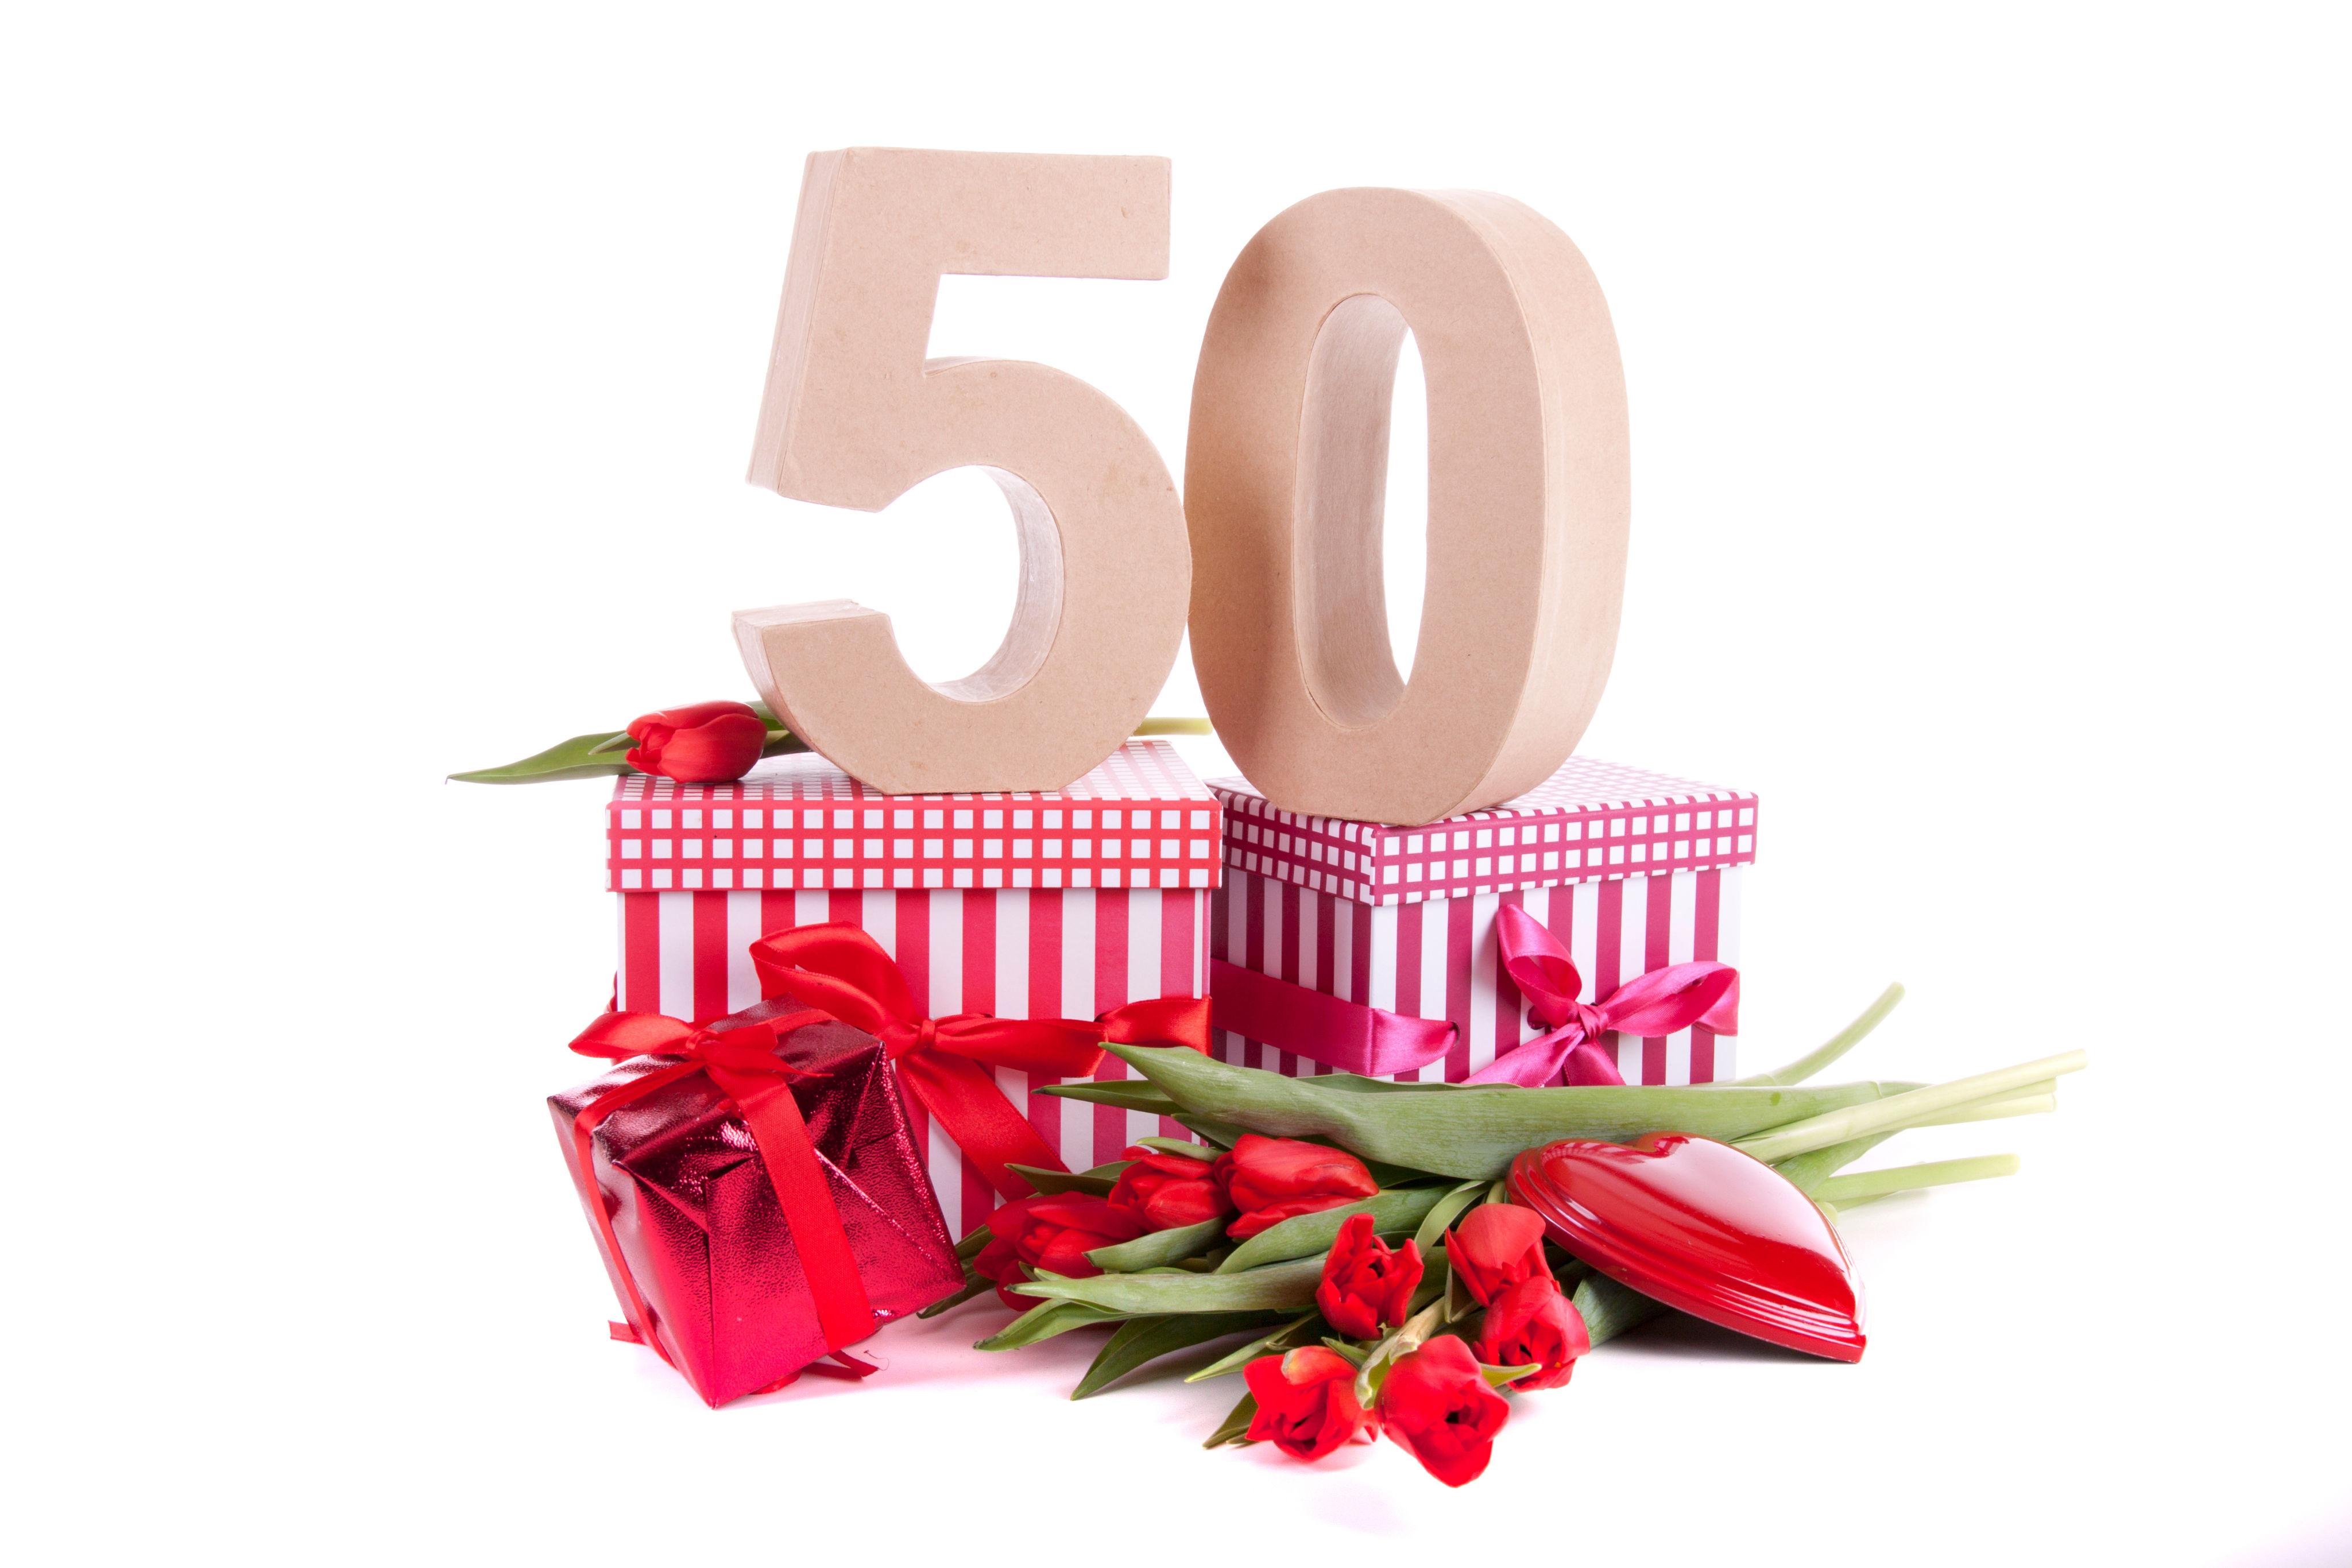 50th-Birthday-Ideas-For-Women